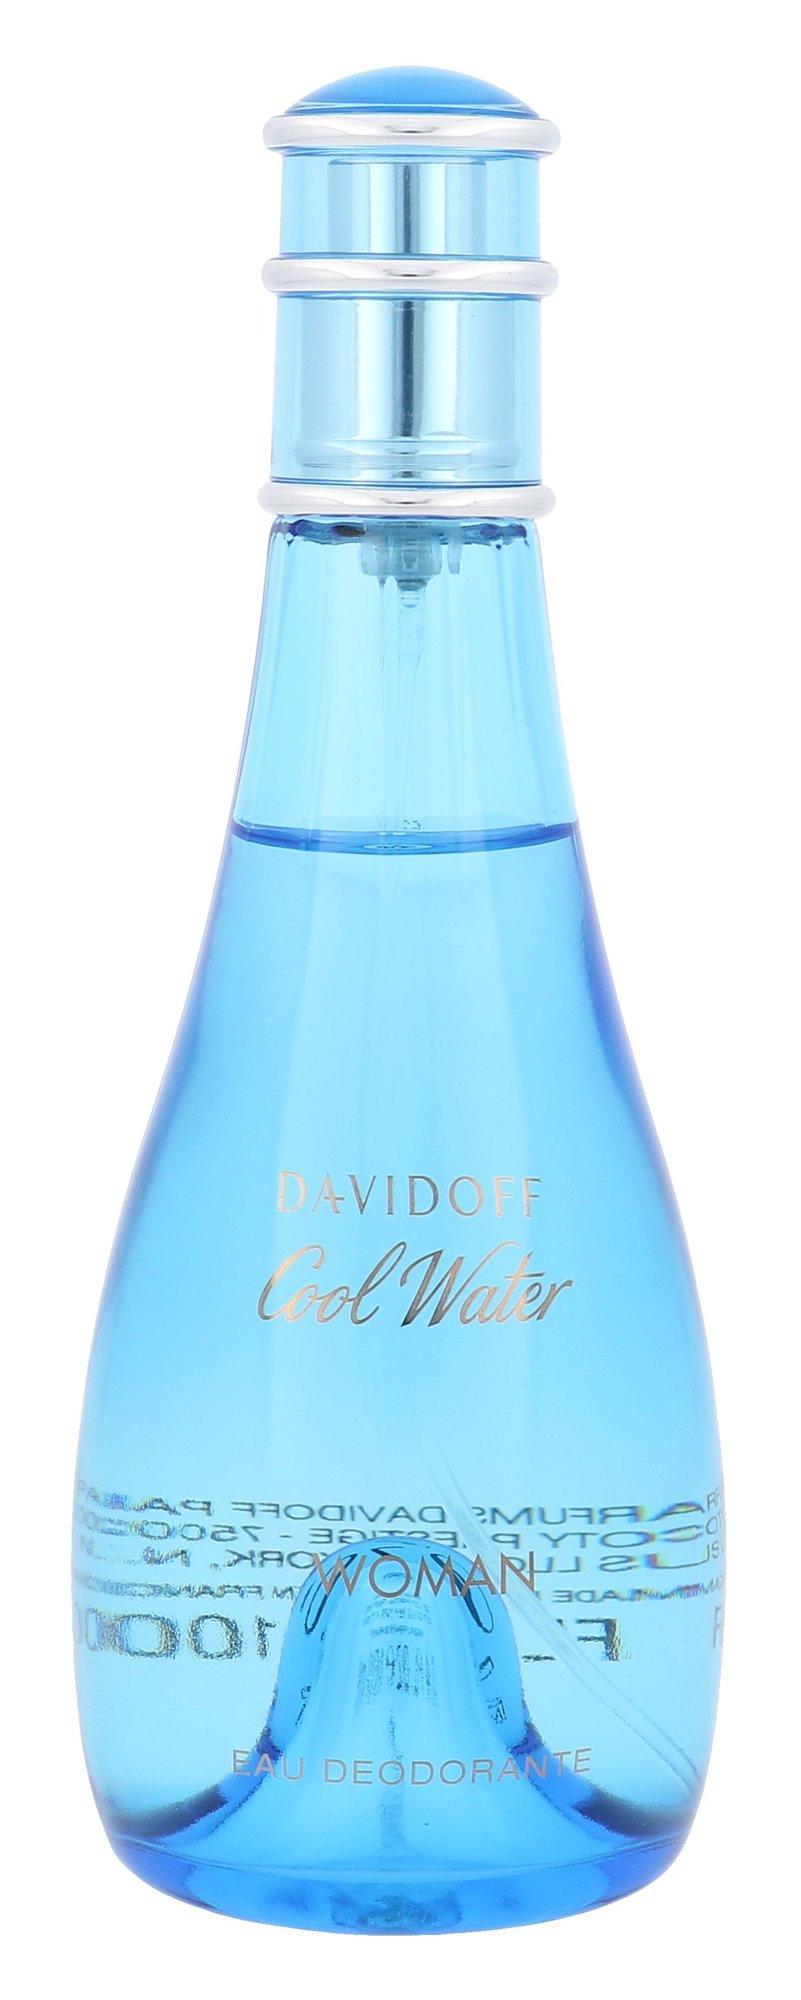 Dezodorantas Davidoff Cool Water